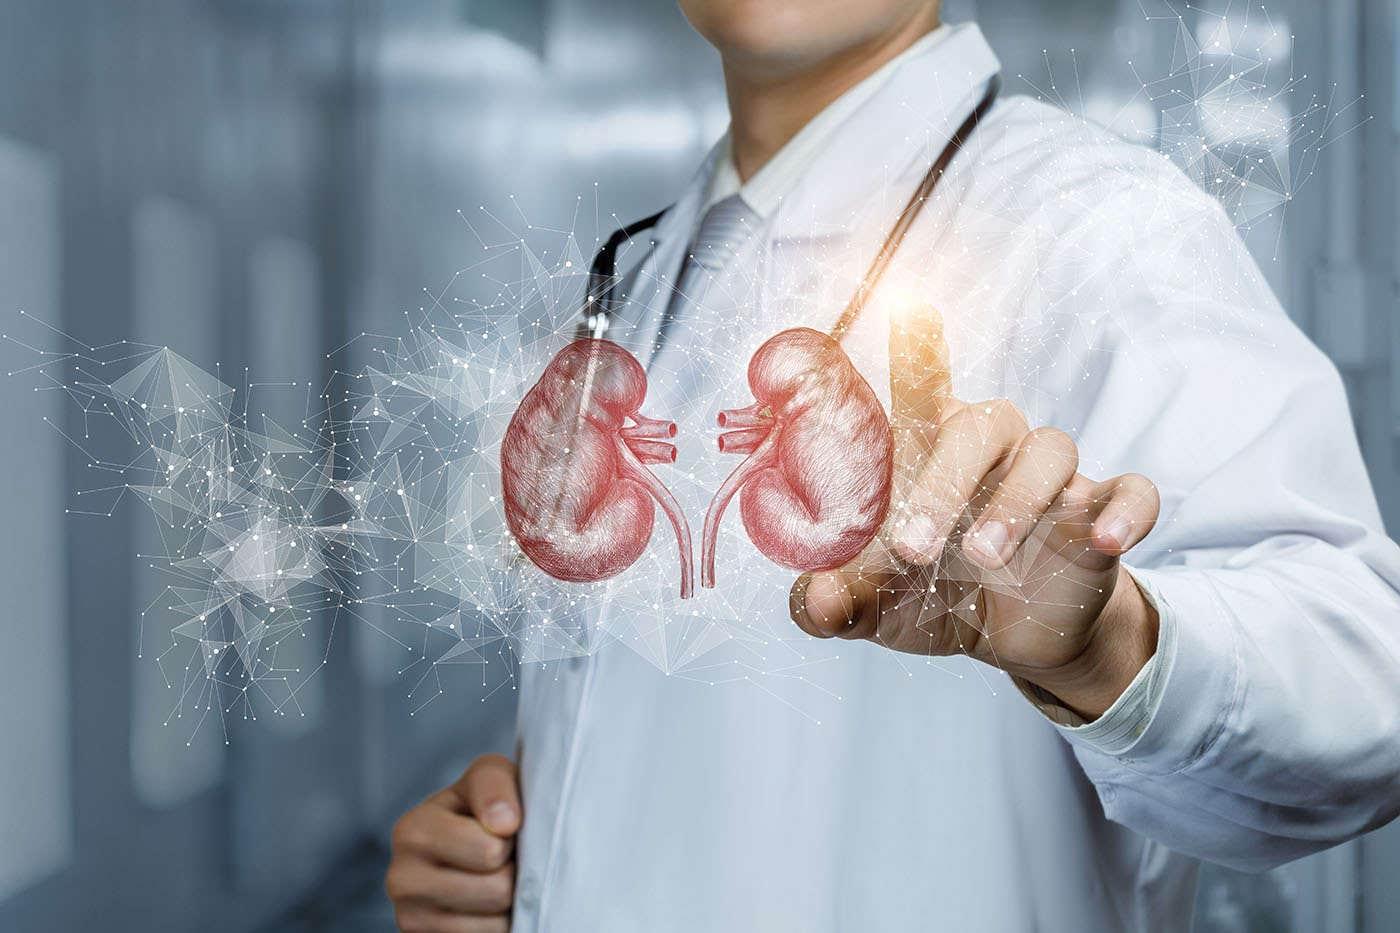 Pacienții cu boli de rinichi pot beneficia de tratamentul cu fier (studiu)